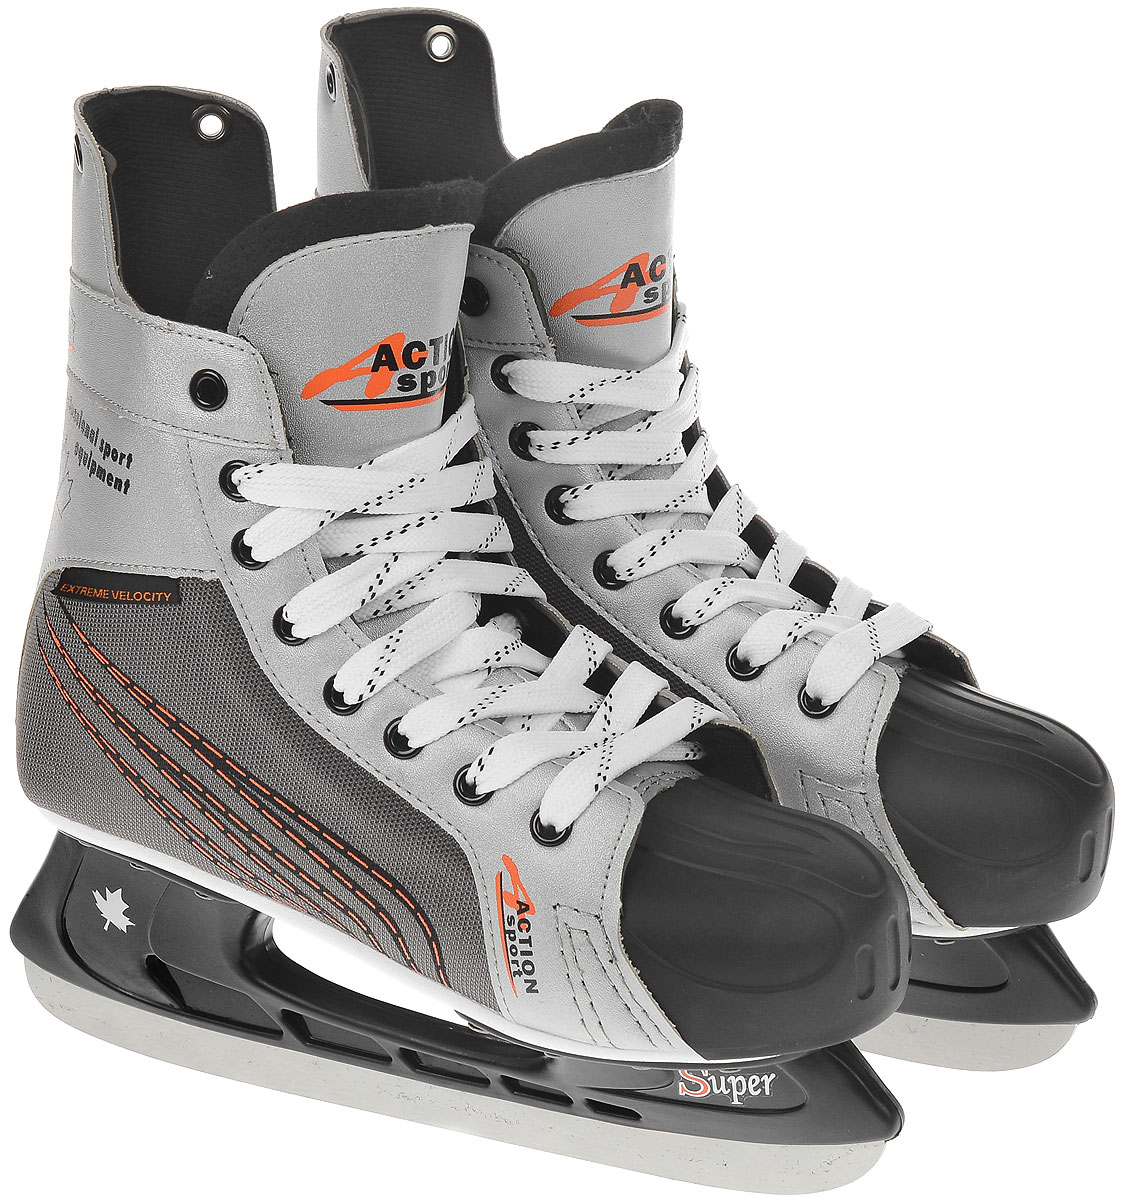 Коньки хоккейные мужские Action, цвет: белый, серый. PW-216N. Размер 42